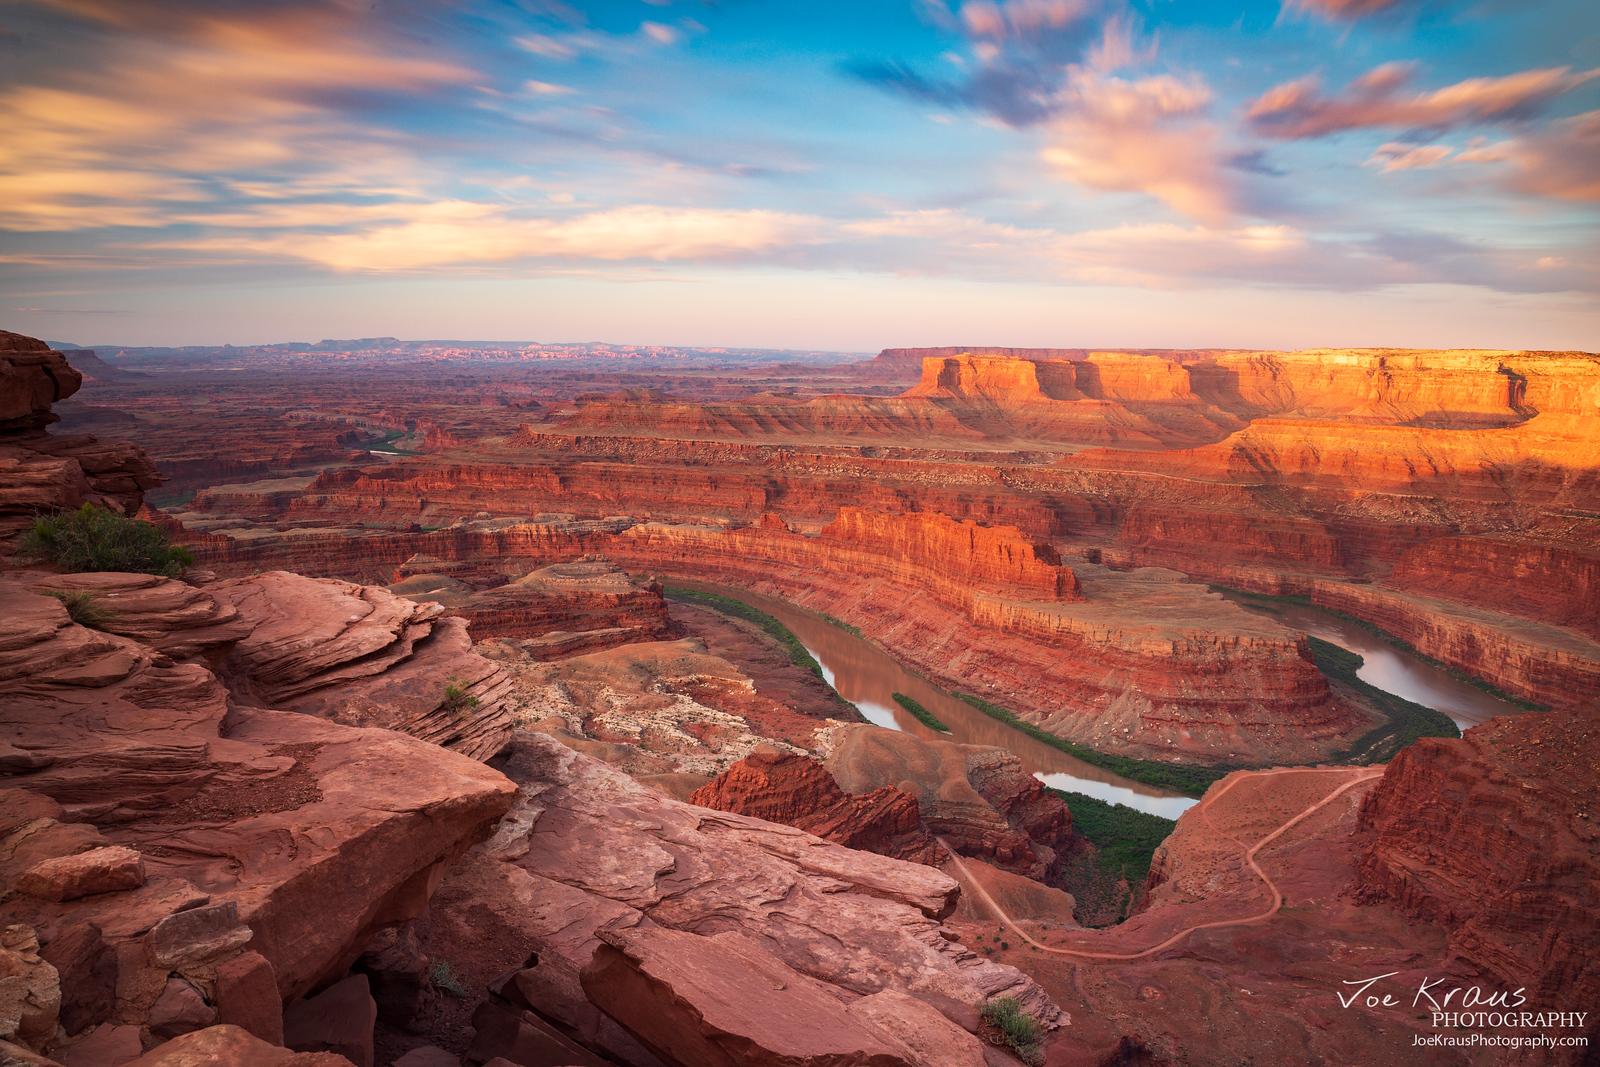 Sunrise over the Colorado